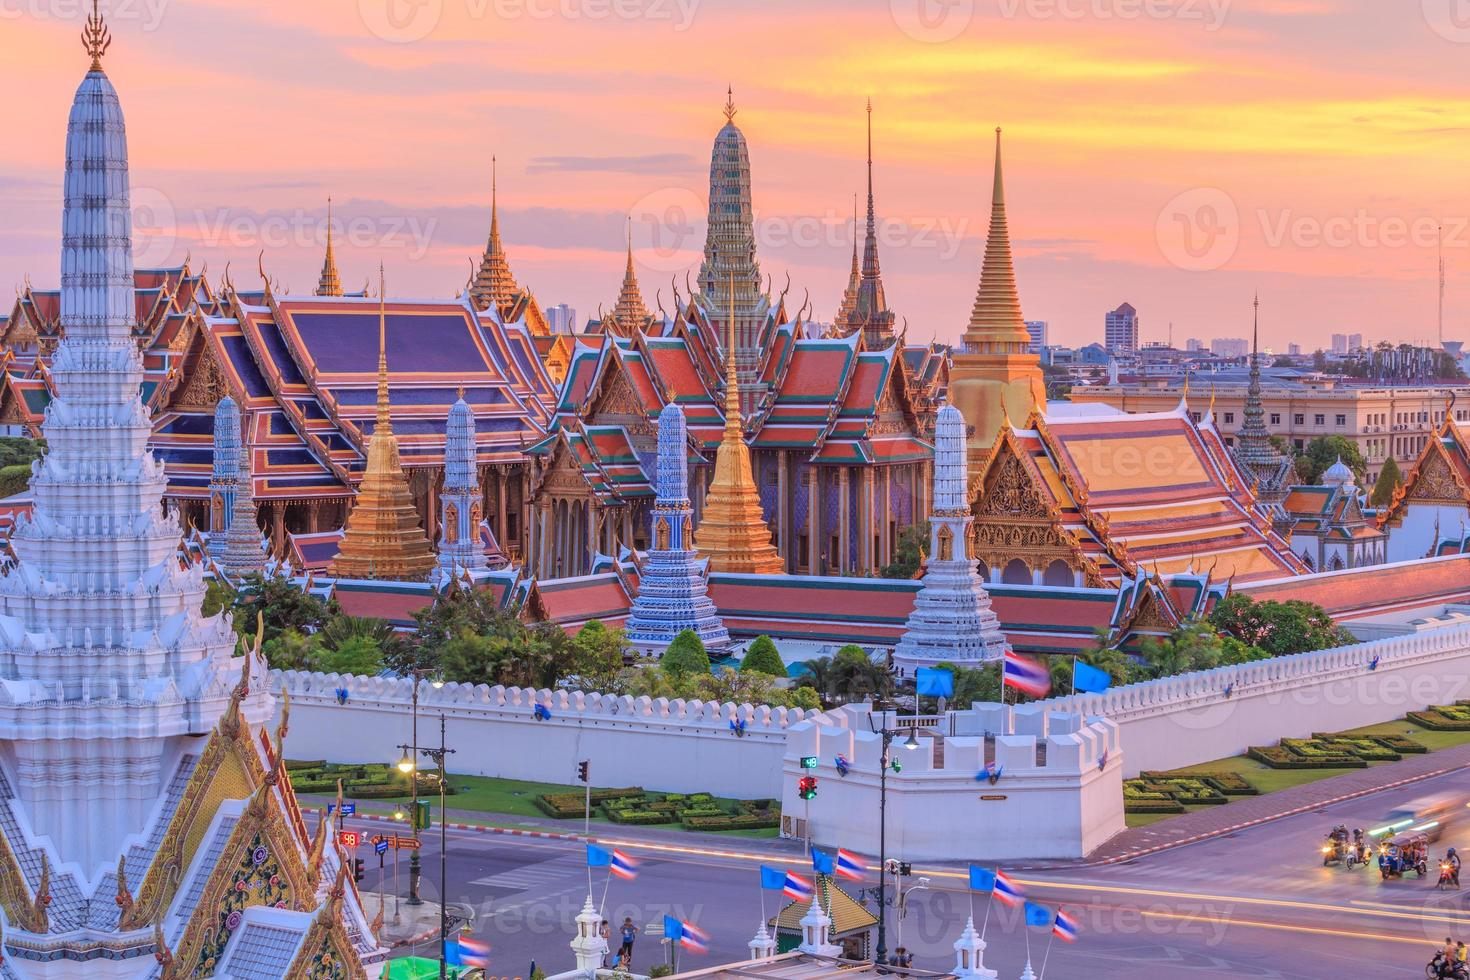 Temple of the Emerald of buddha or Wat Phra Kaew photo